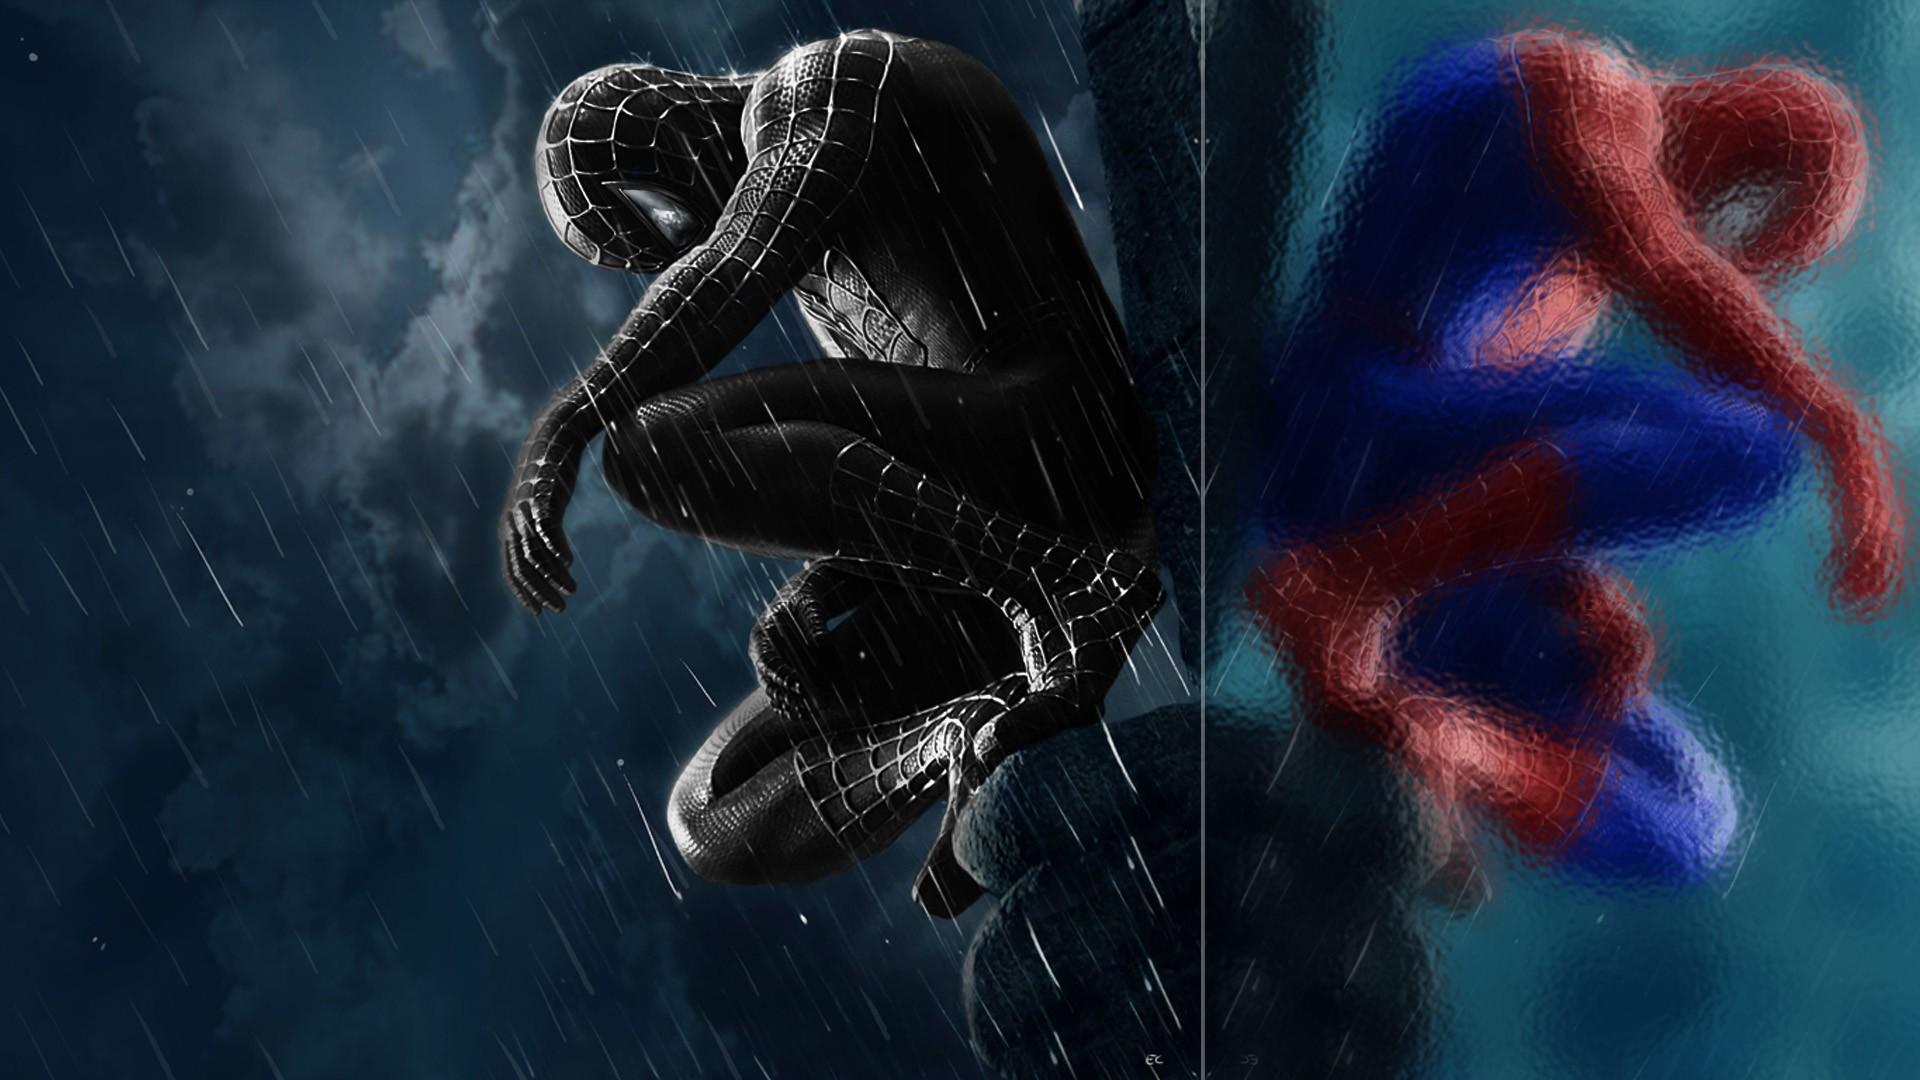 … Spiderman Wallpaper Download HD